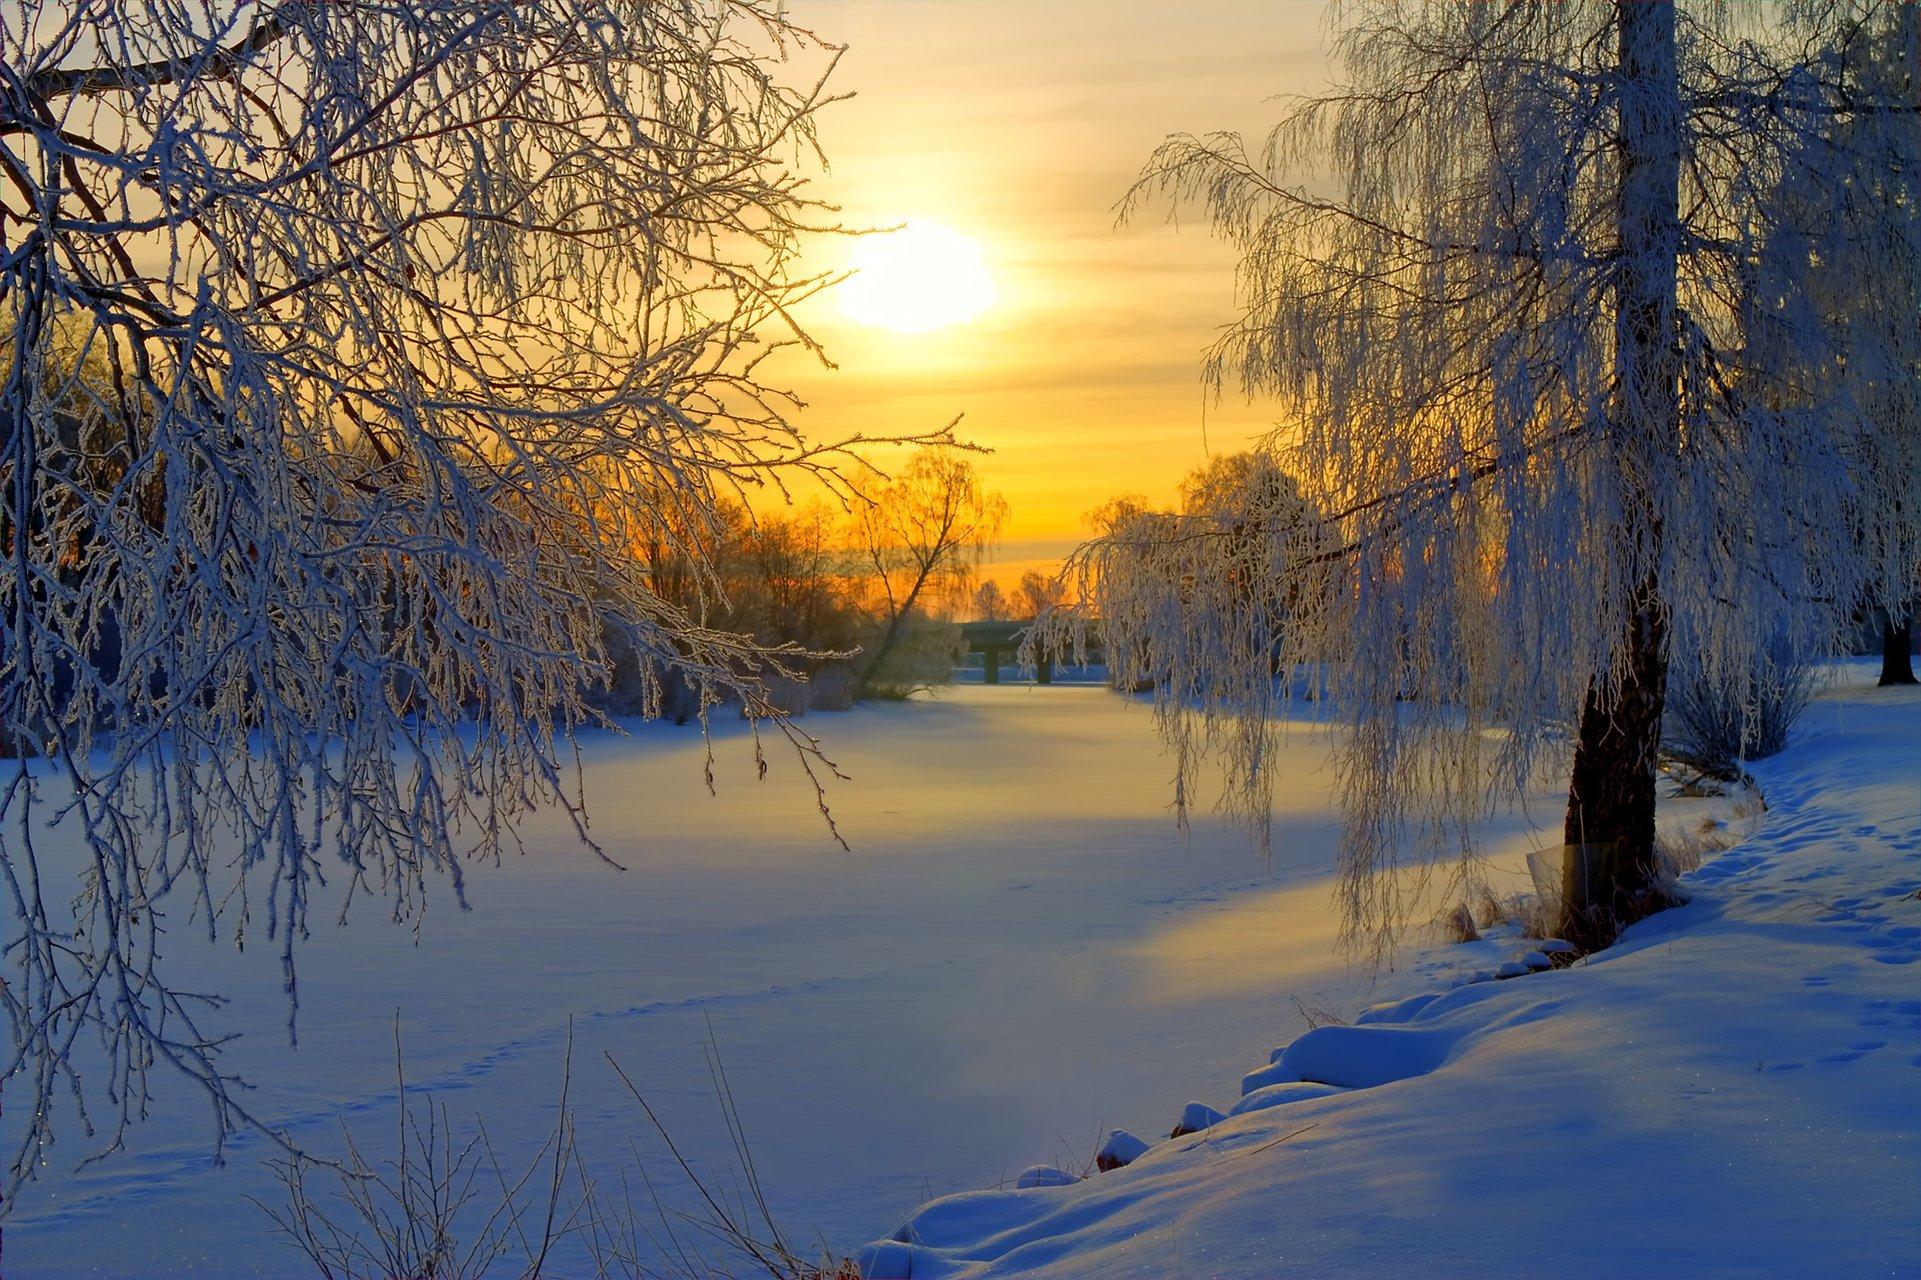 Картинки красивые виды санкт петербурга увидел